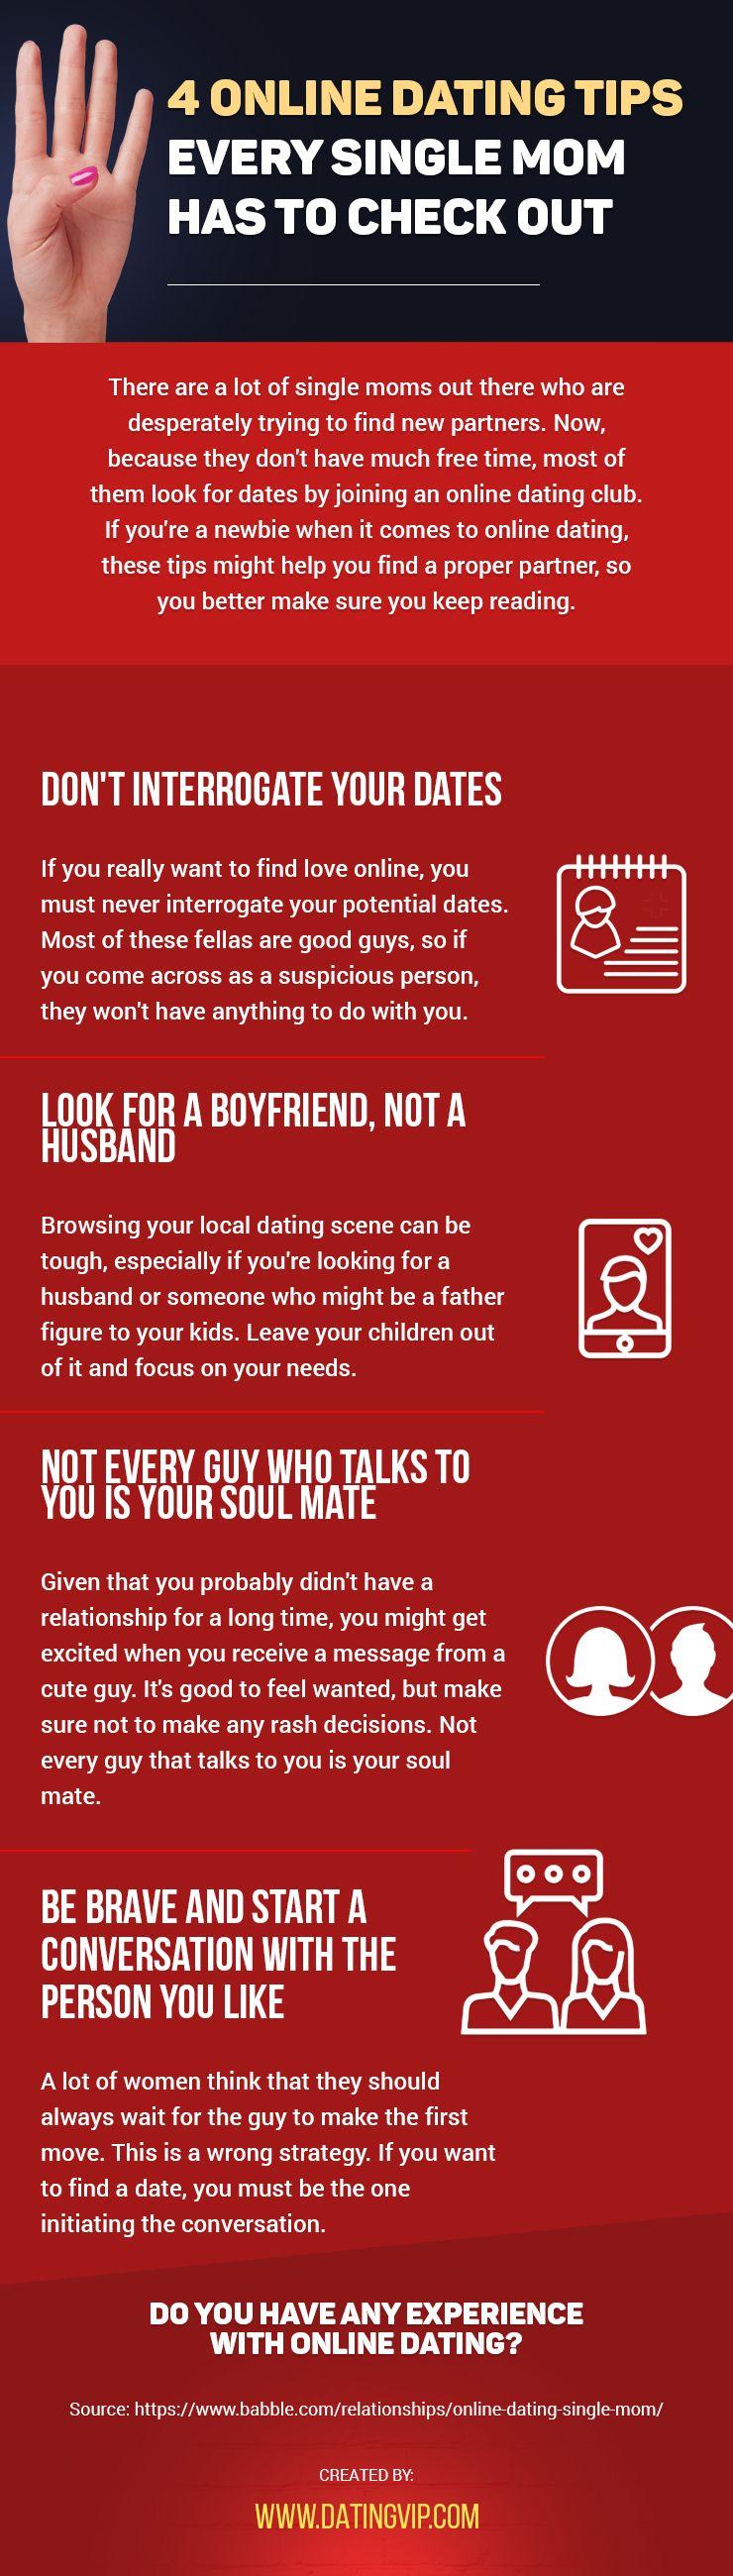 interracial dating jealousy